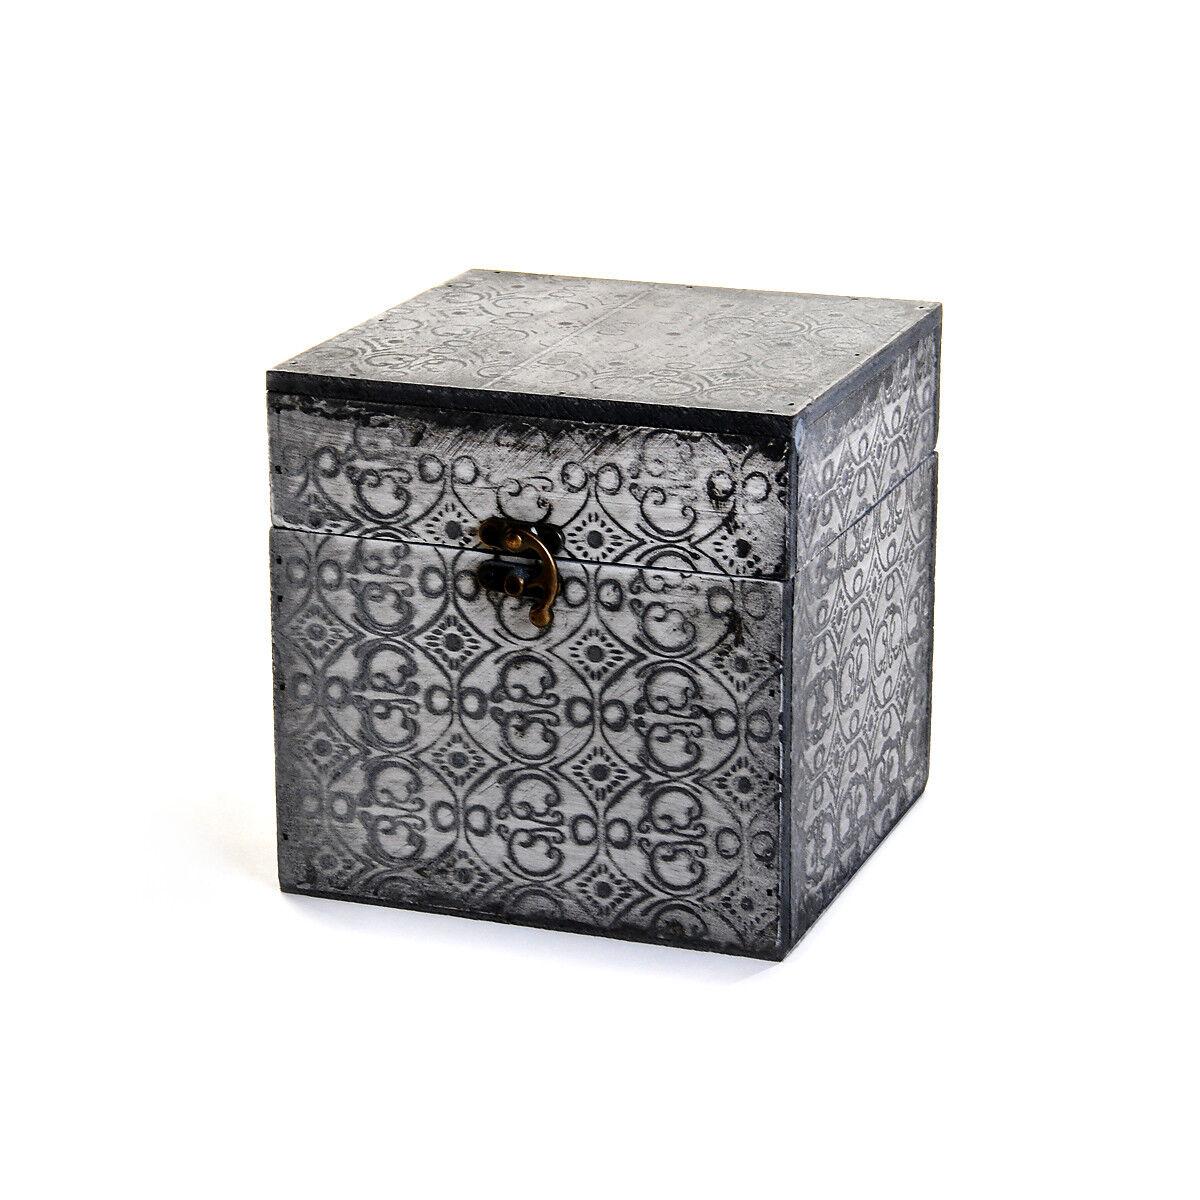 aufbewahrungsbox holz grau ca17 x 17 x 17 cm depot de. Black Bedroom Furniture Sets. Home Design Ideas